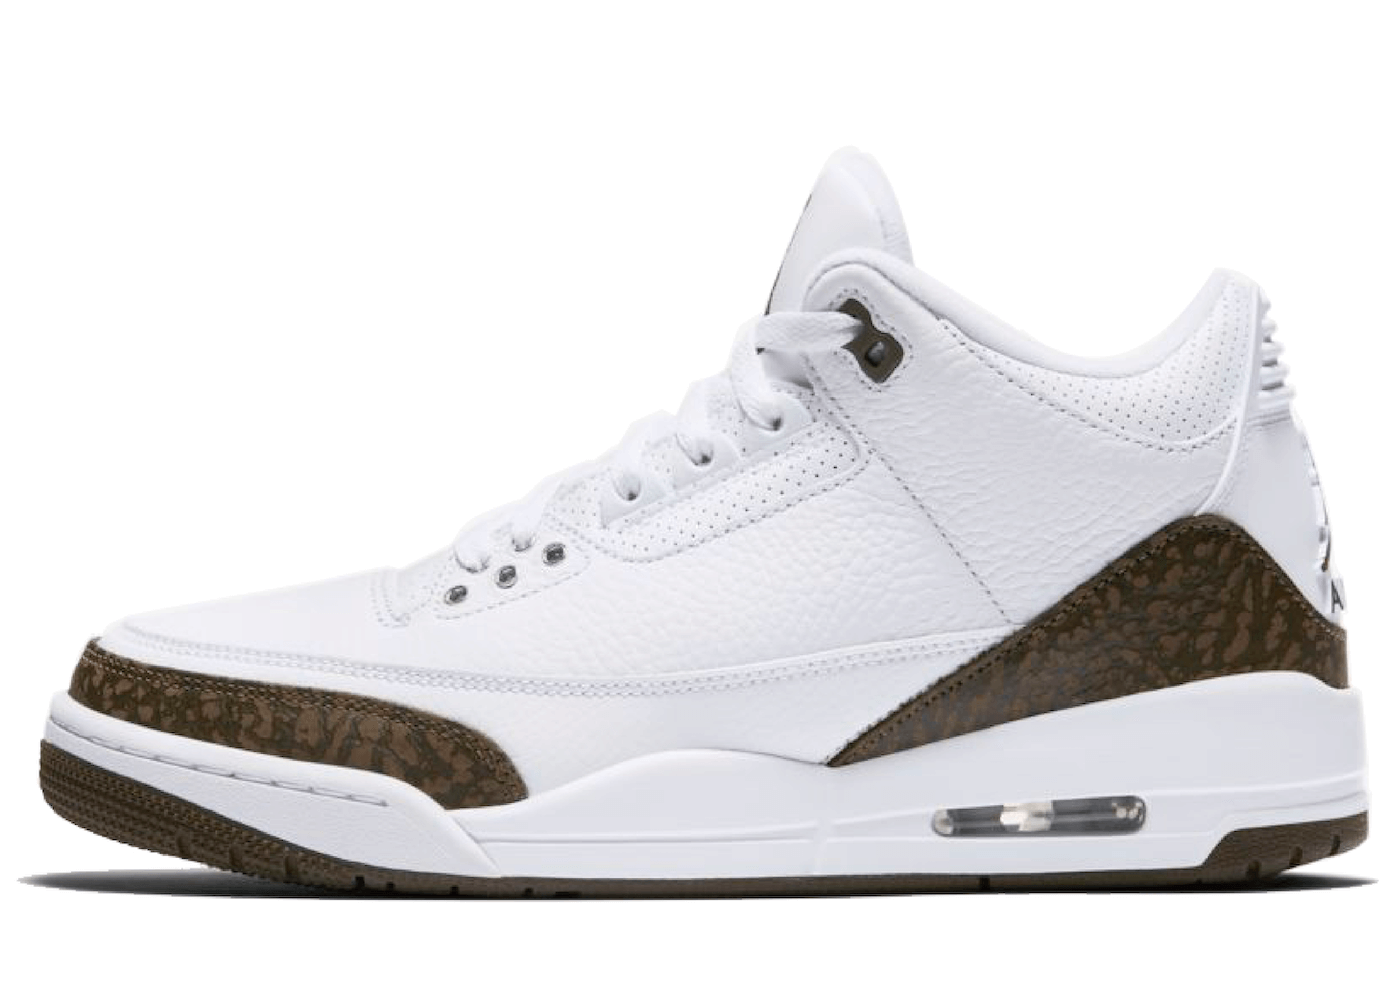 Nike Air Jordan 3 Retro Mocha (2018)の写真